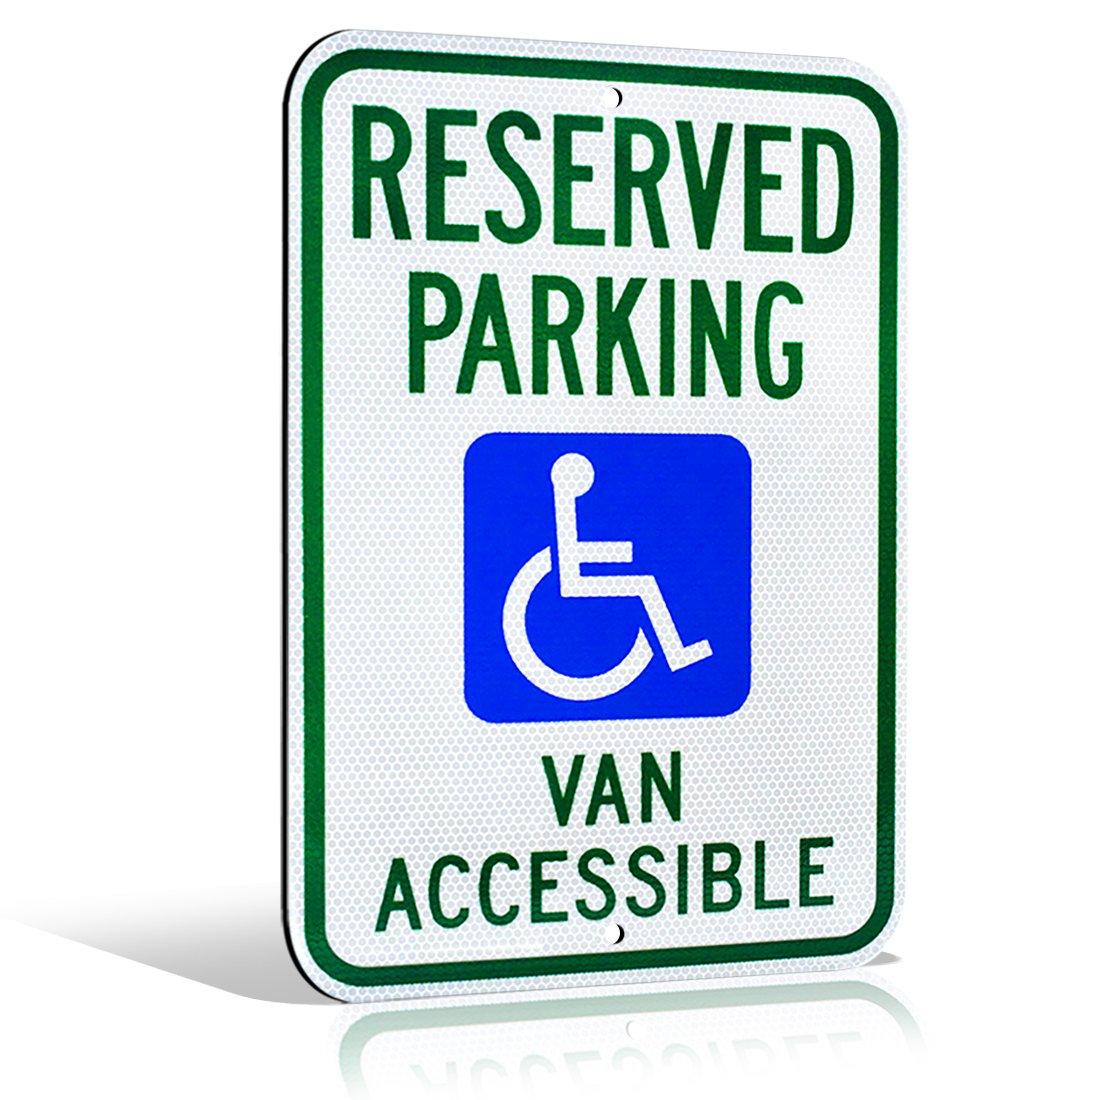 Legend VAN ACCESSIBLE 12 Width x 6 Height Tapco R7-8B High Intensity Prismatic Rectangular ADA Handicap Sign Aluminum Blue on White